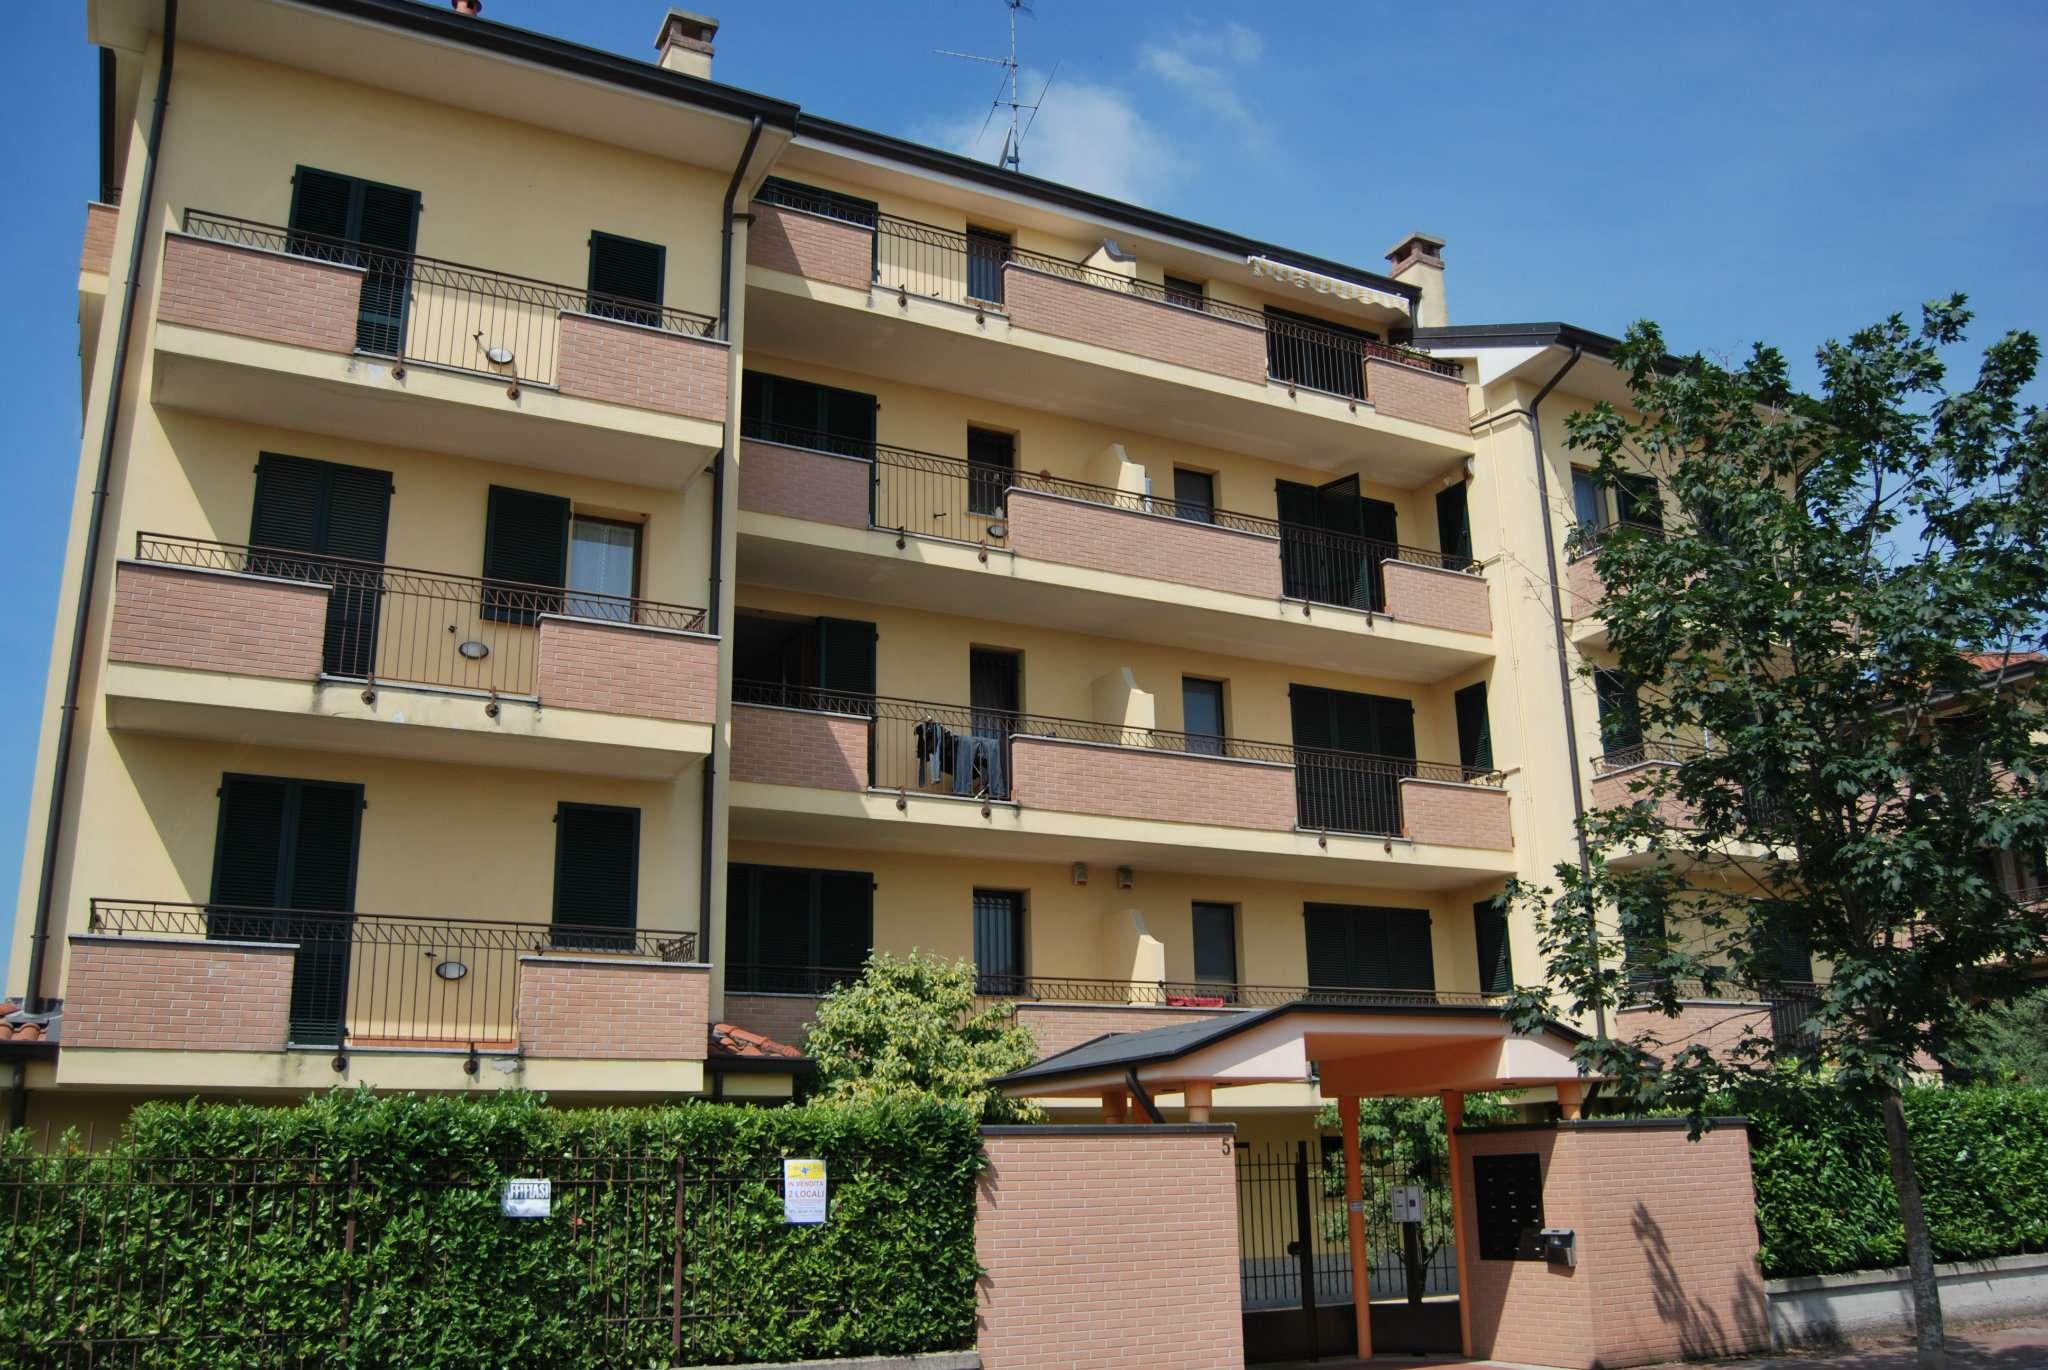 Bilocale Pregnana Milanese Via Trento 3